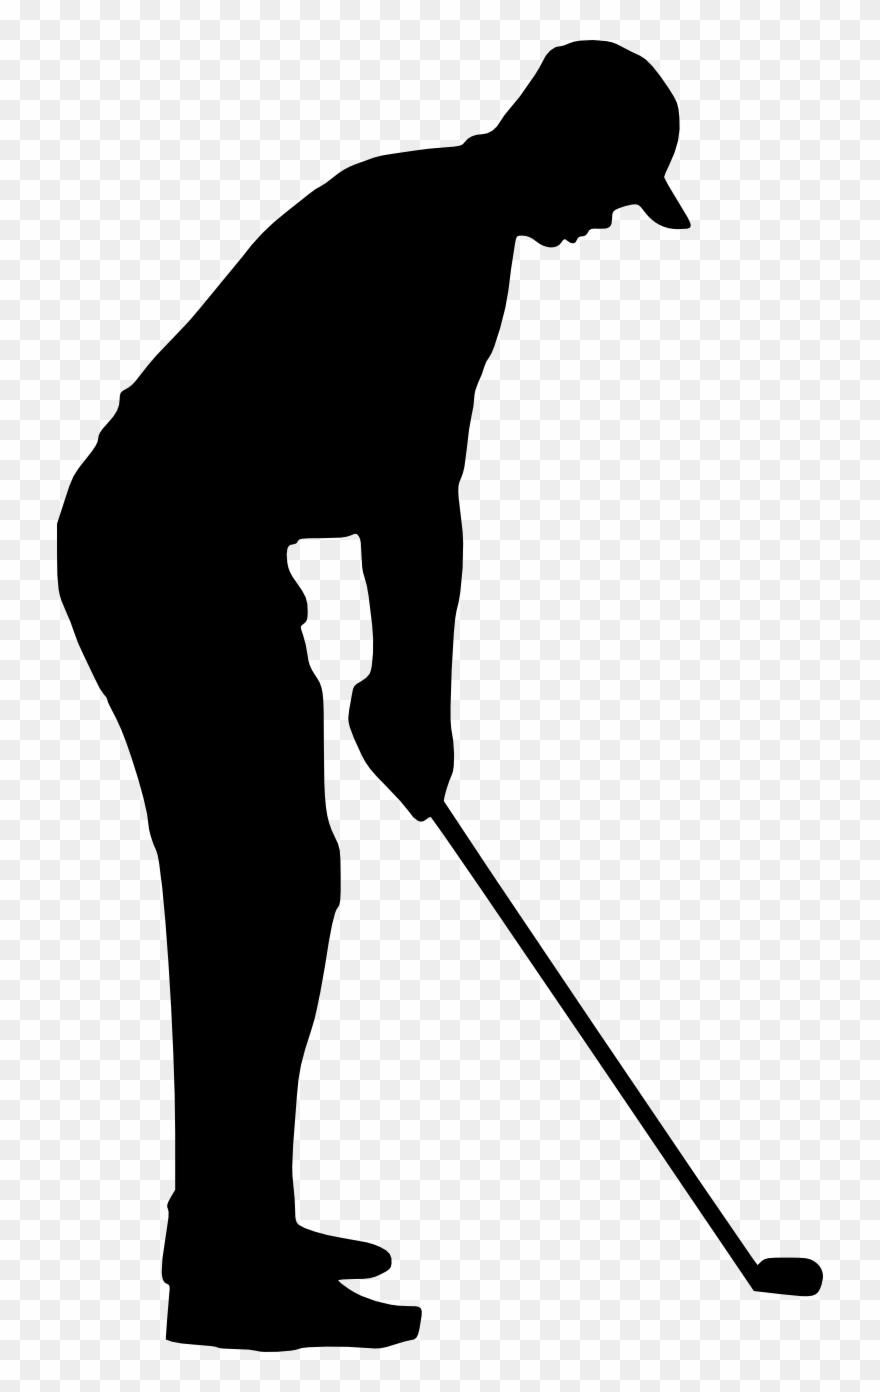 medium resolution of golfing clipart retro sport transparent background golf clipart png download